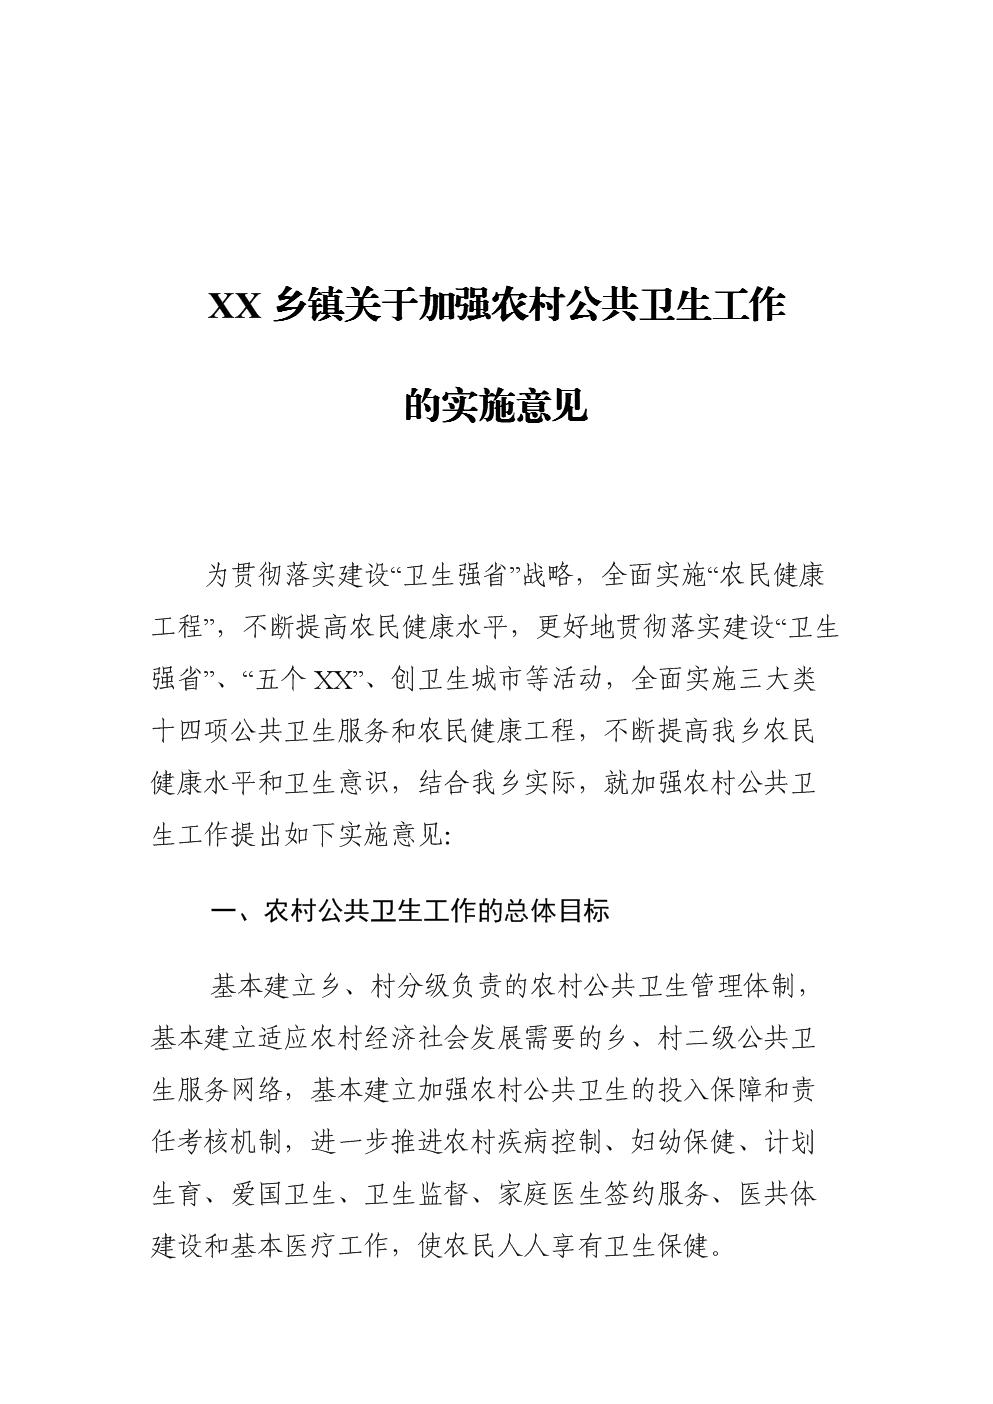 XX乡镇关于加强农村公共卫生工作的实施意见.docx